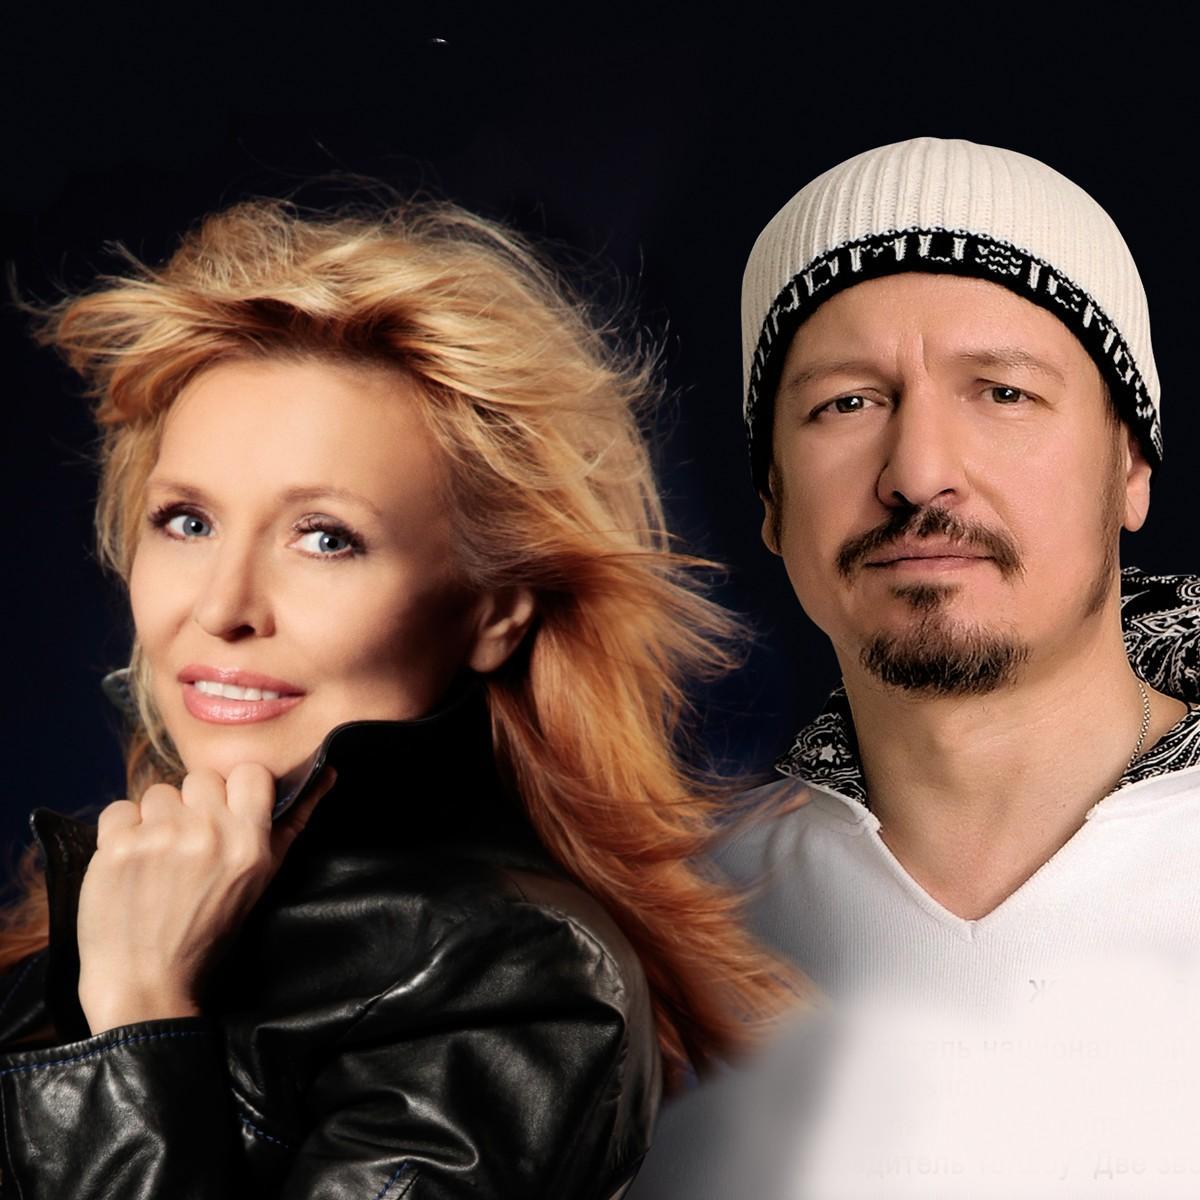 novyj-klip-olgi-kormuhinoj-i-alekseya-belova-video